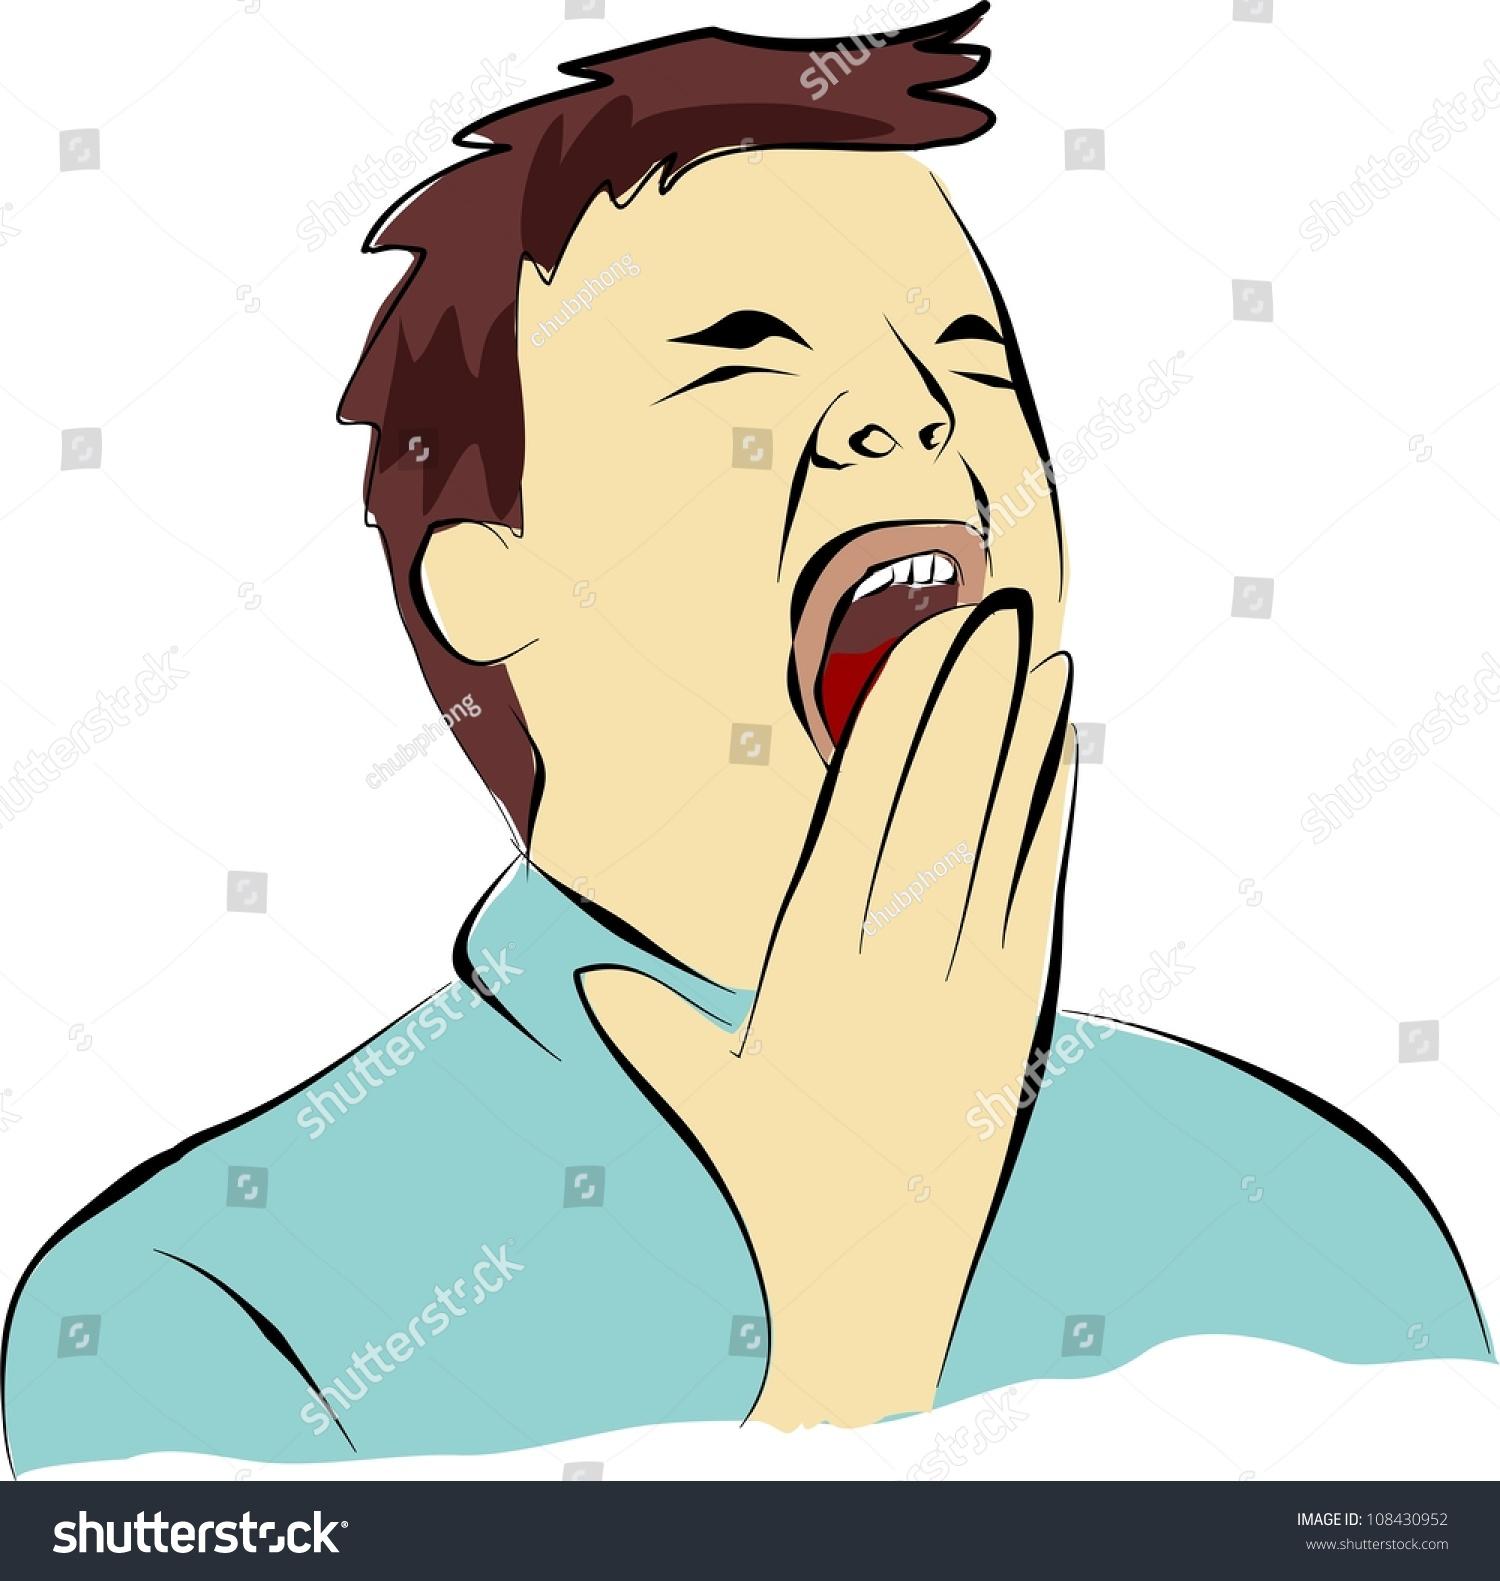 Yawn Gape Stock Illustration 108430952 - Shutterstock